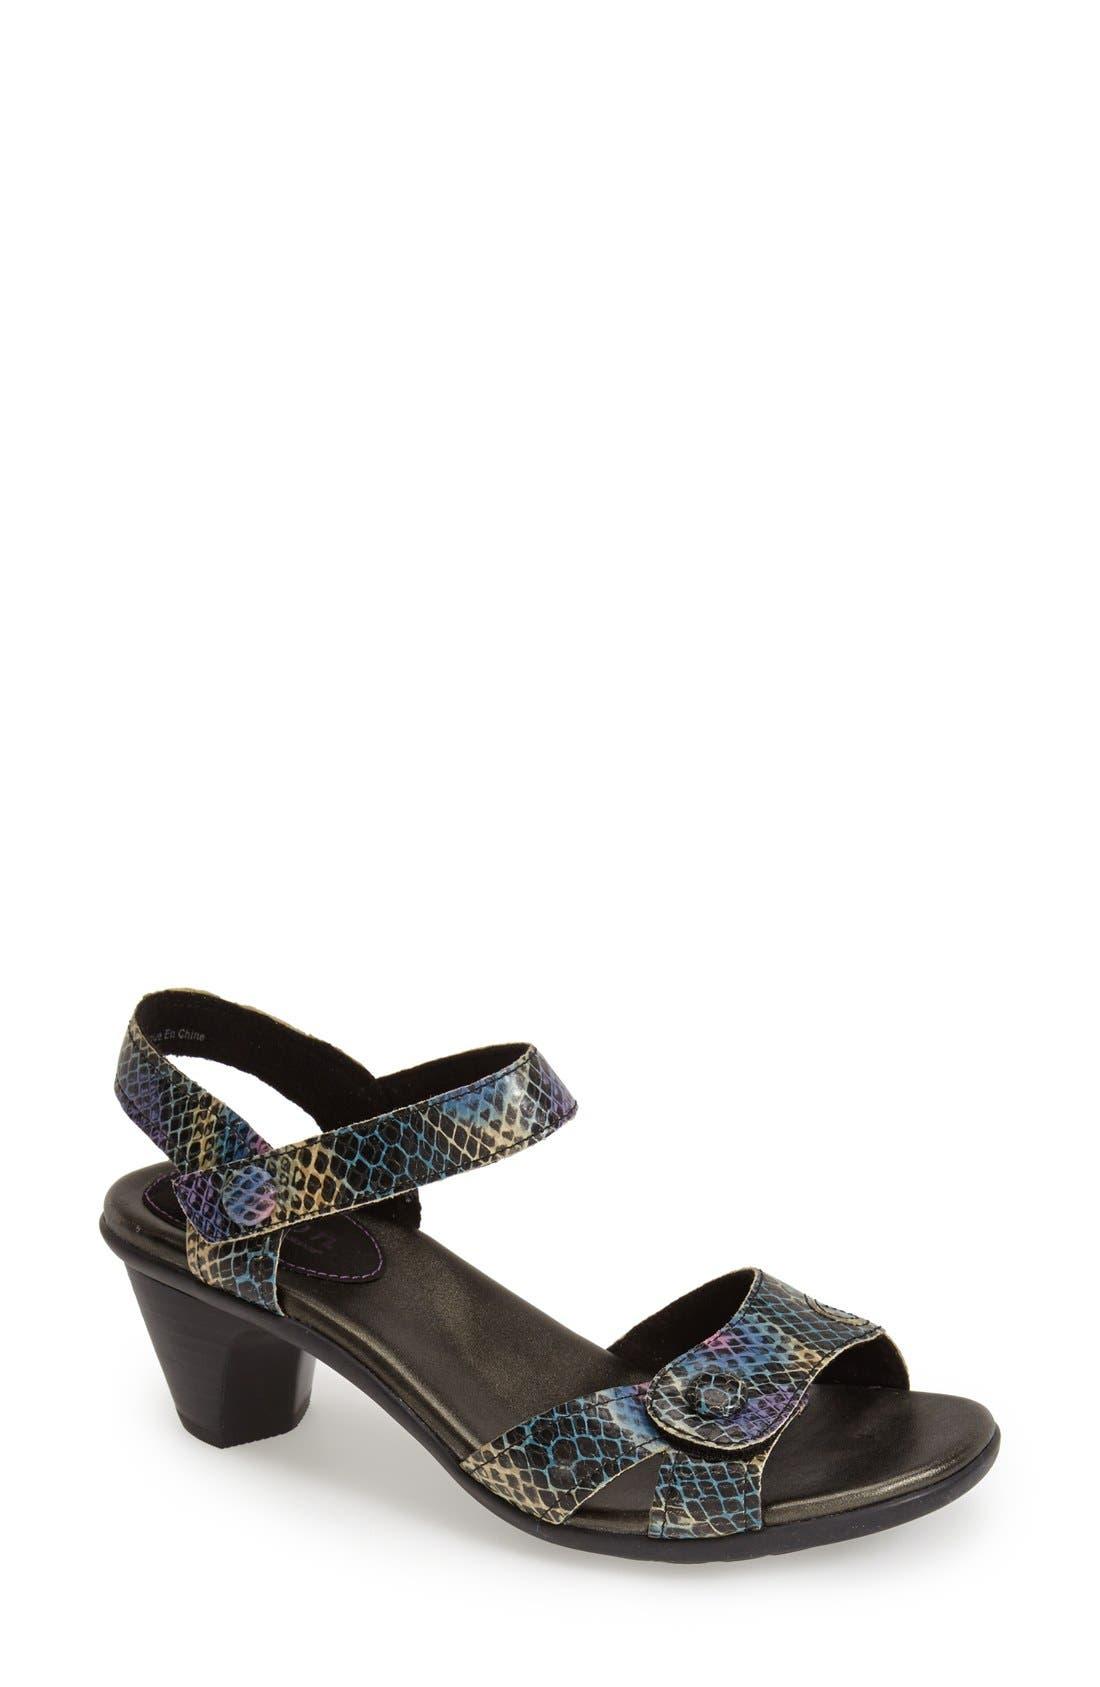 Alternate Image 1 Selected - Aravon 'Mila' Sandal